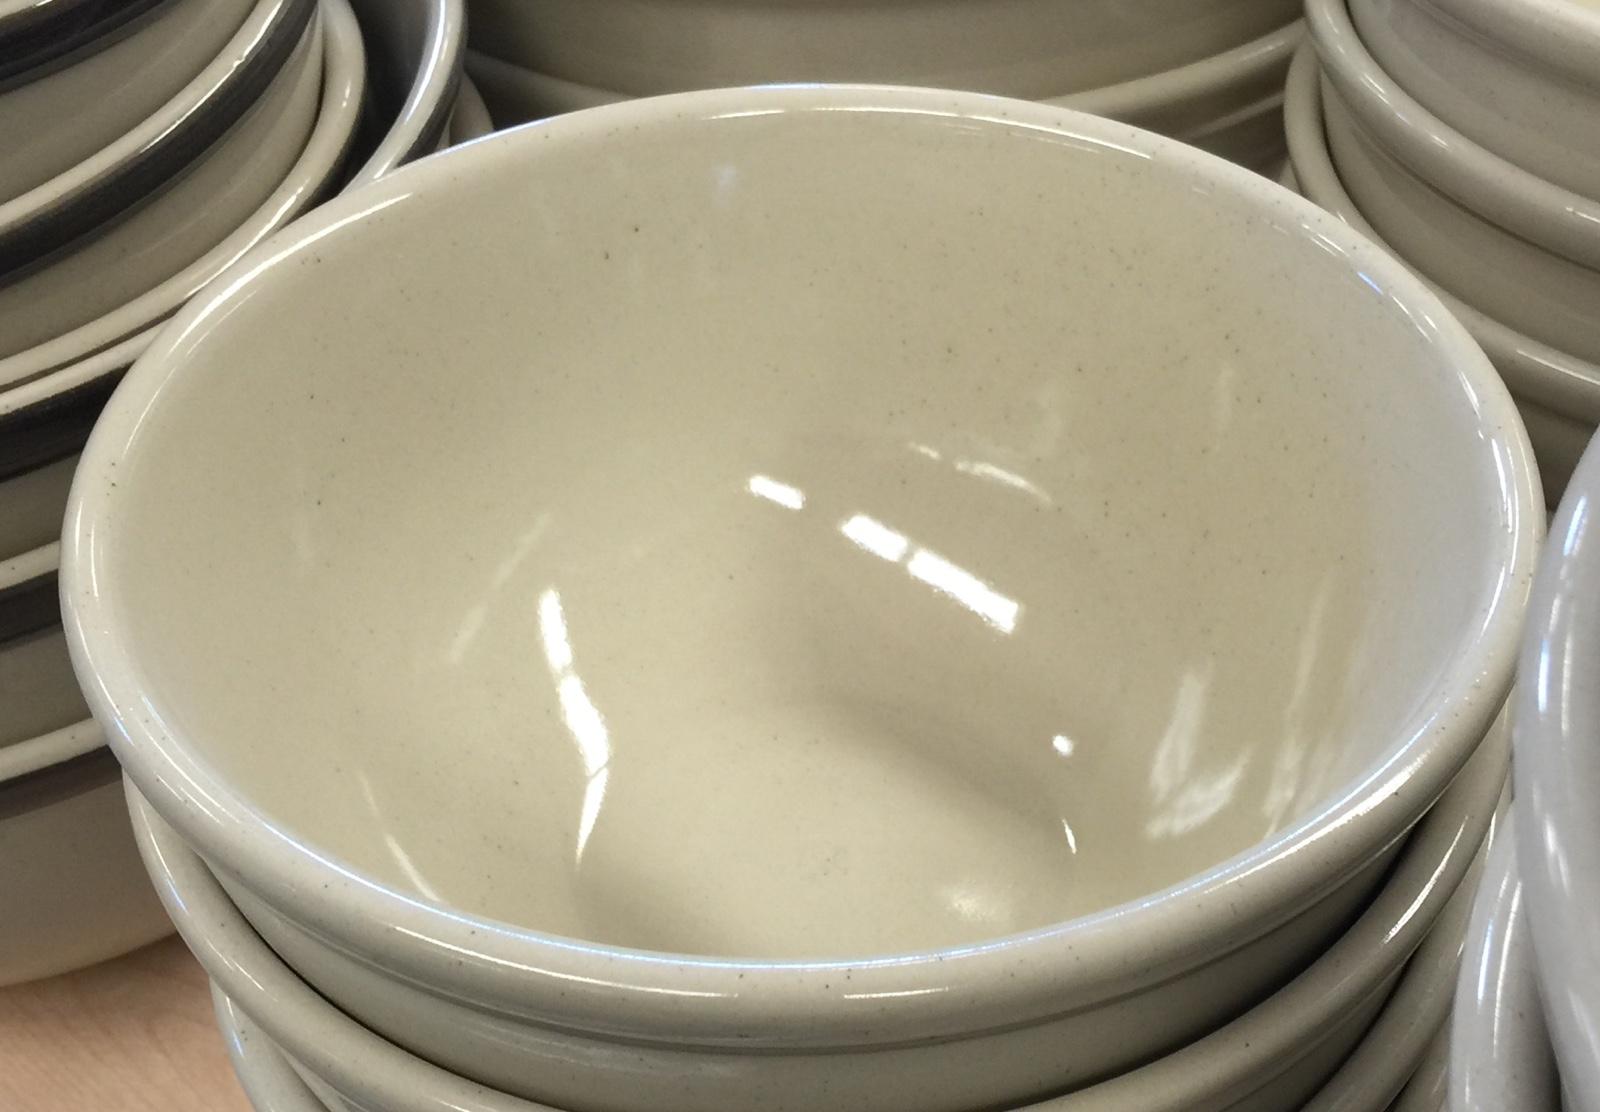 Surface treatment affects glaze speck development in jiggered stoneware